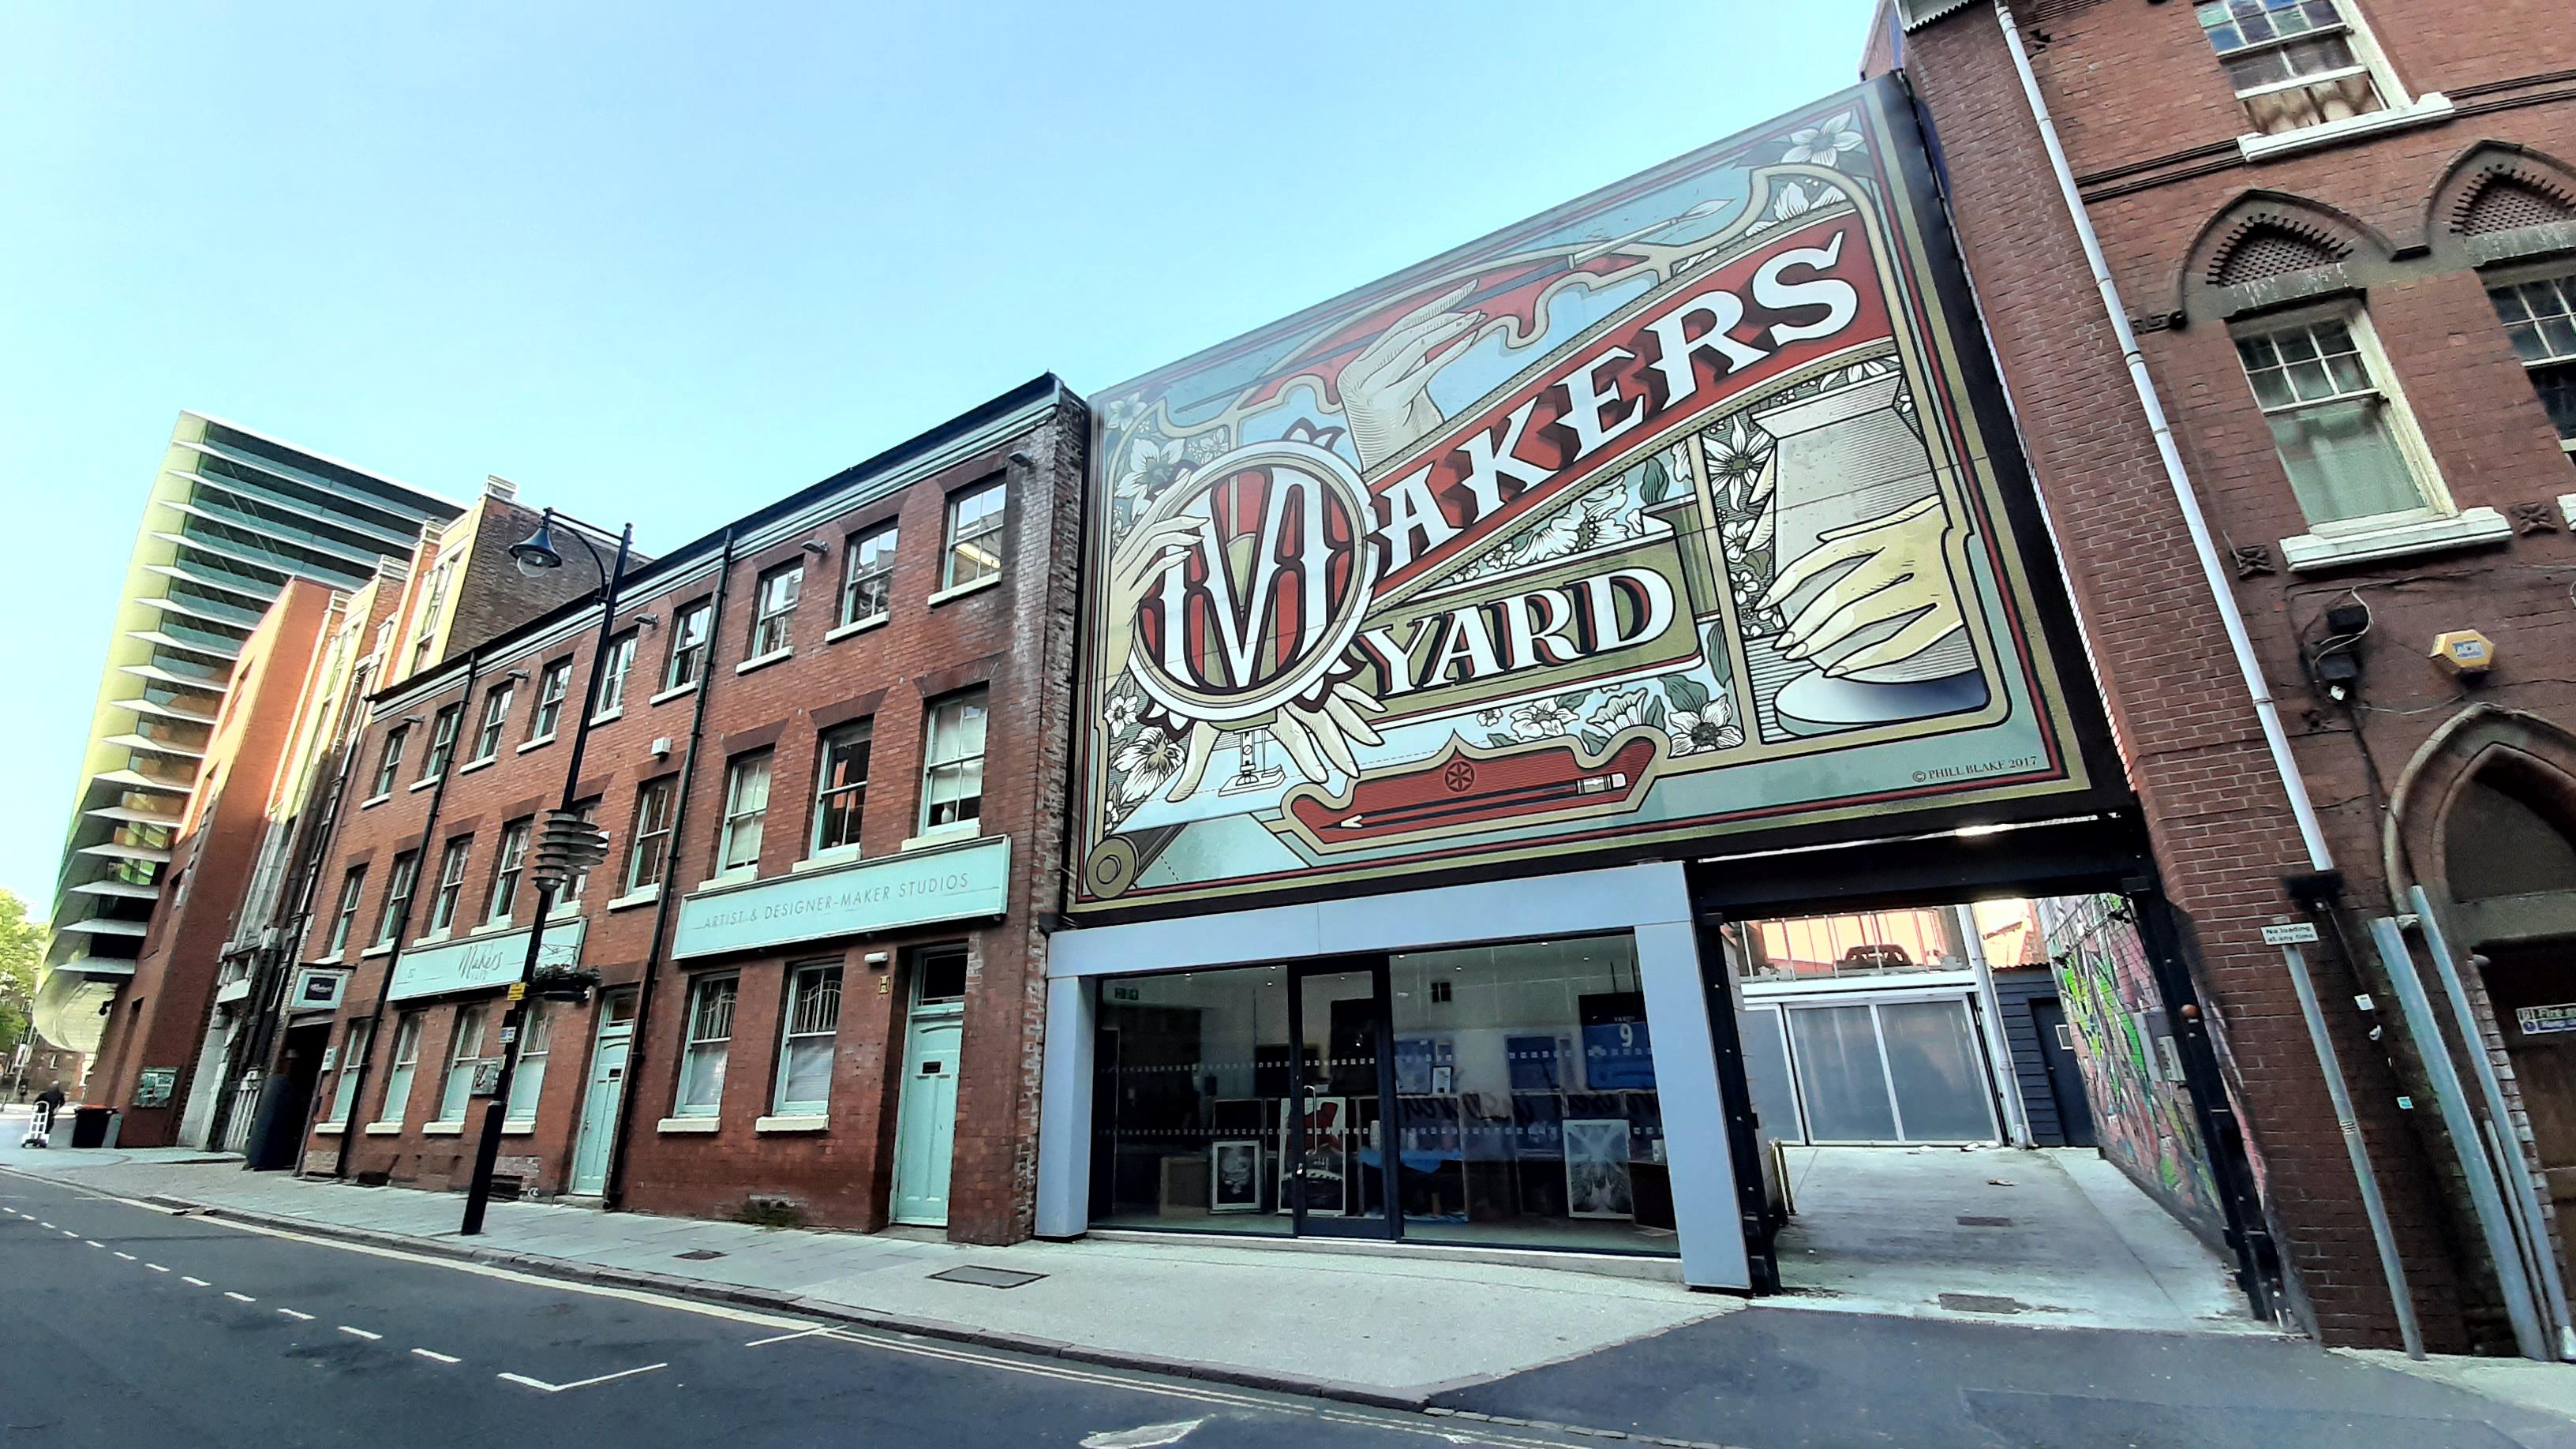 Makers' Yard front facade June 2021